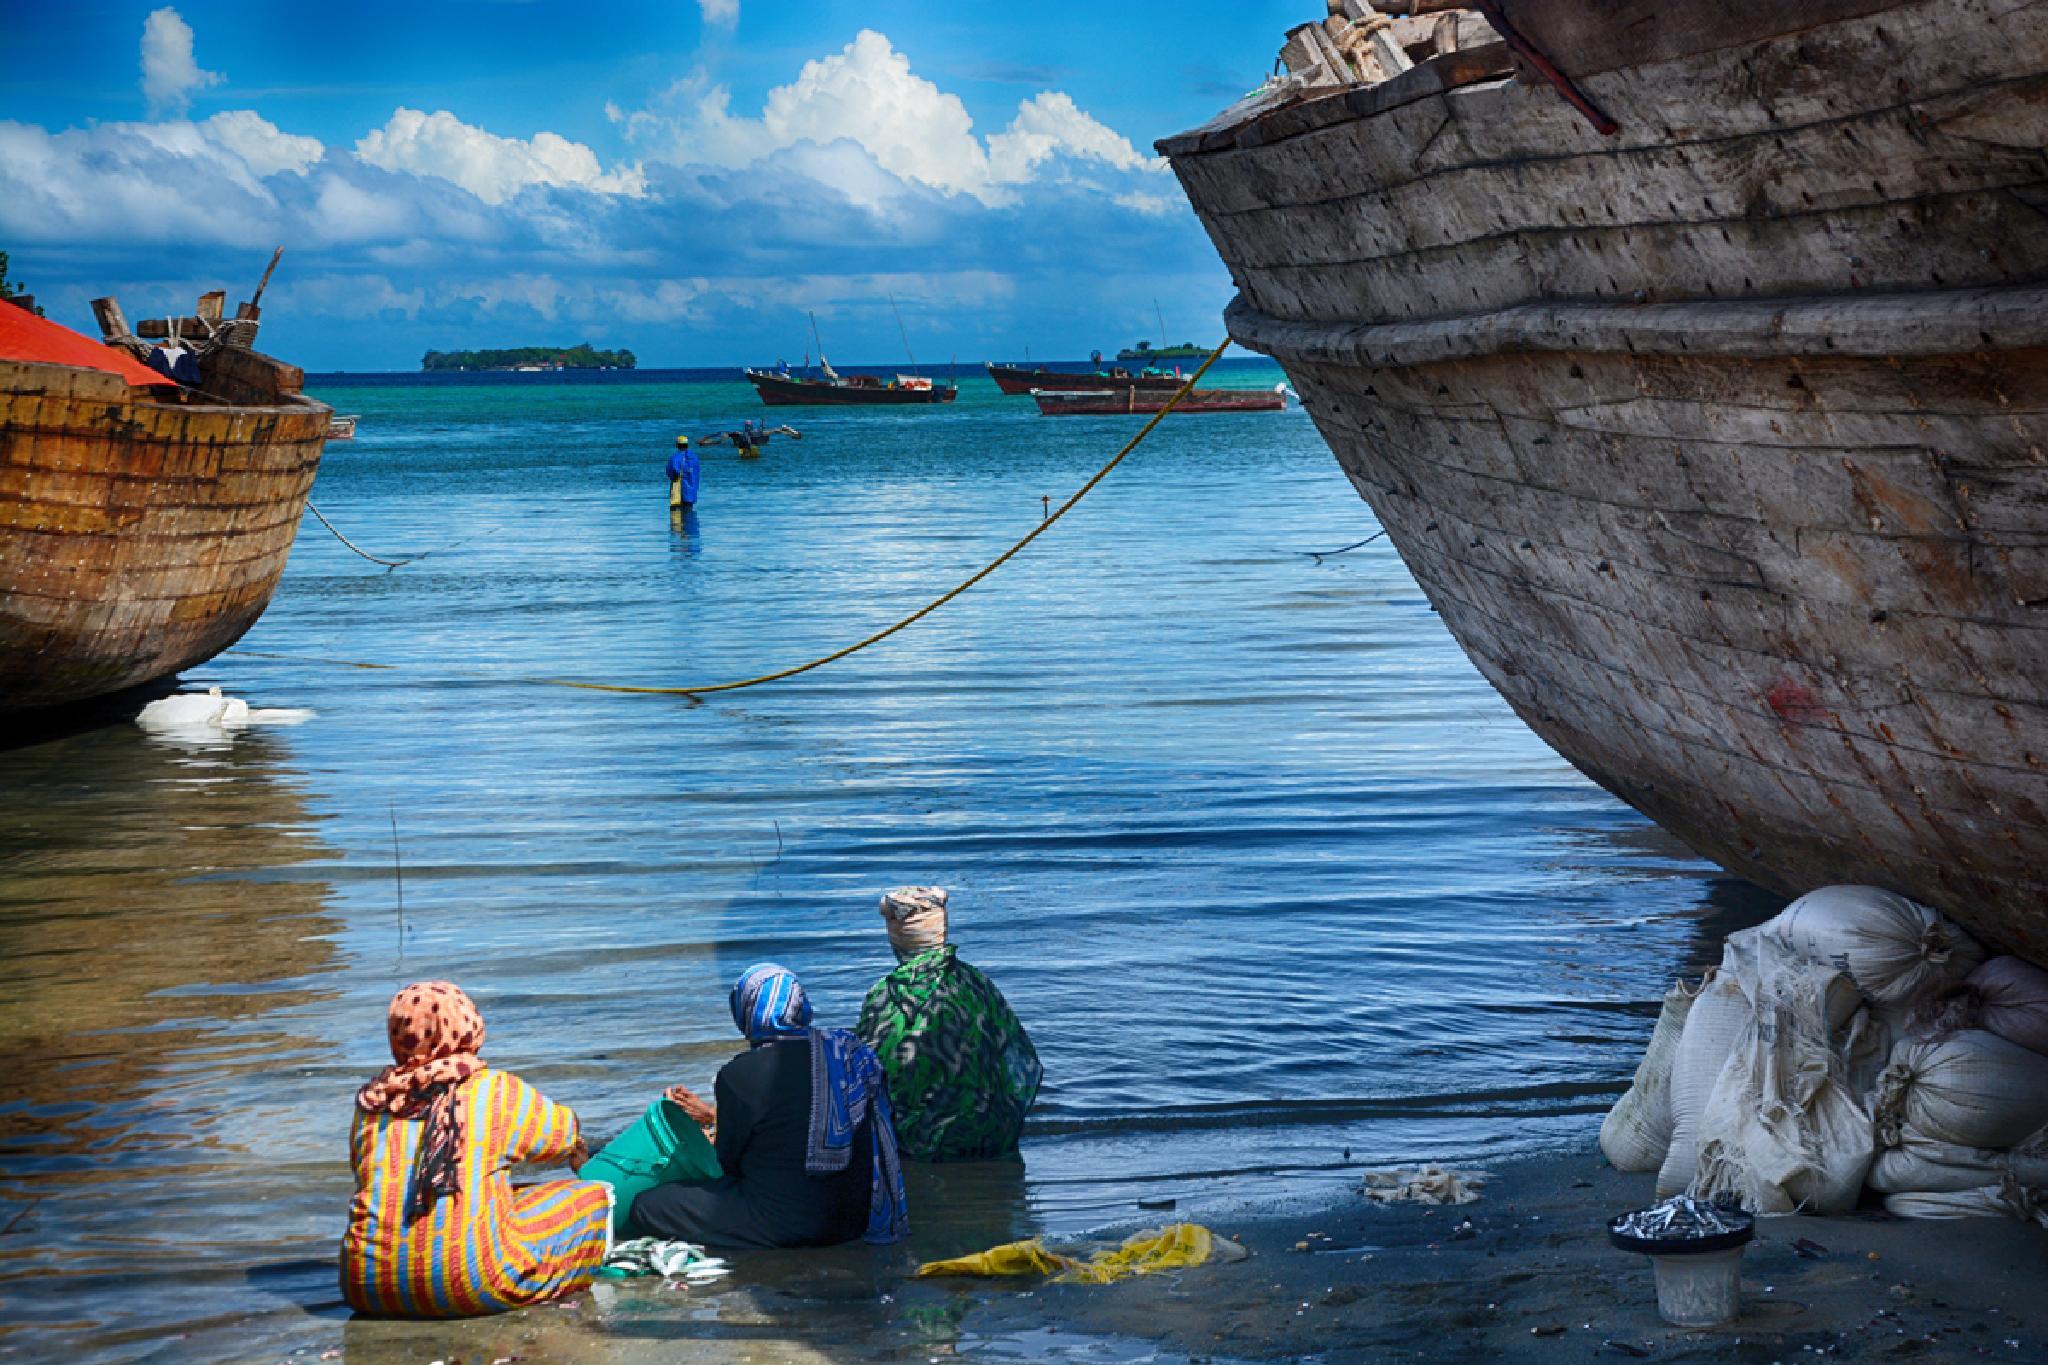 fisherwomen of zanzibar by Abdurrahman Aksoy